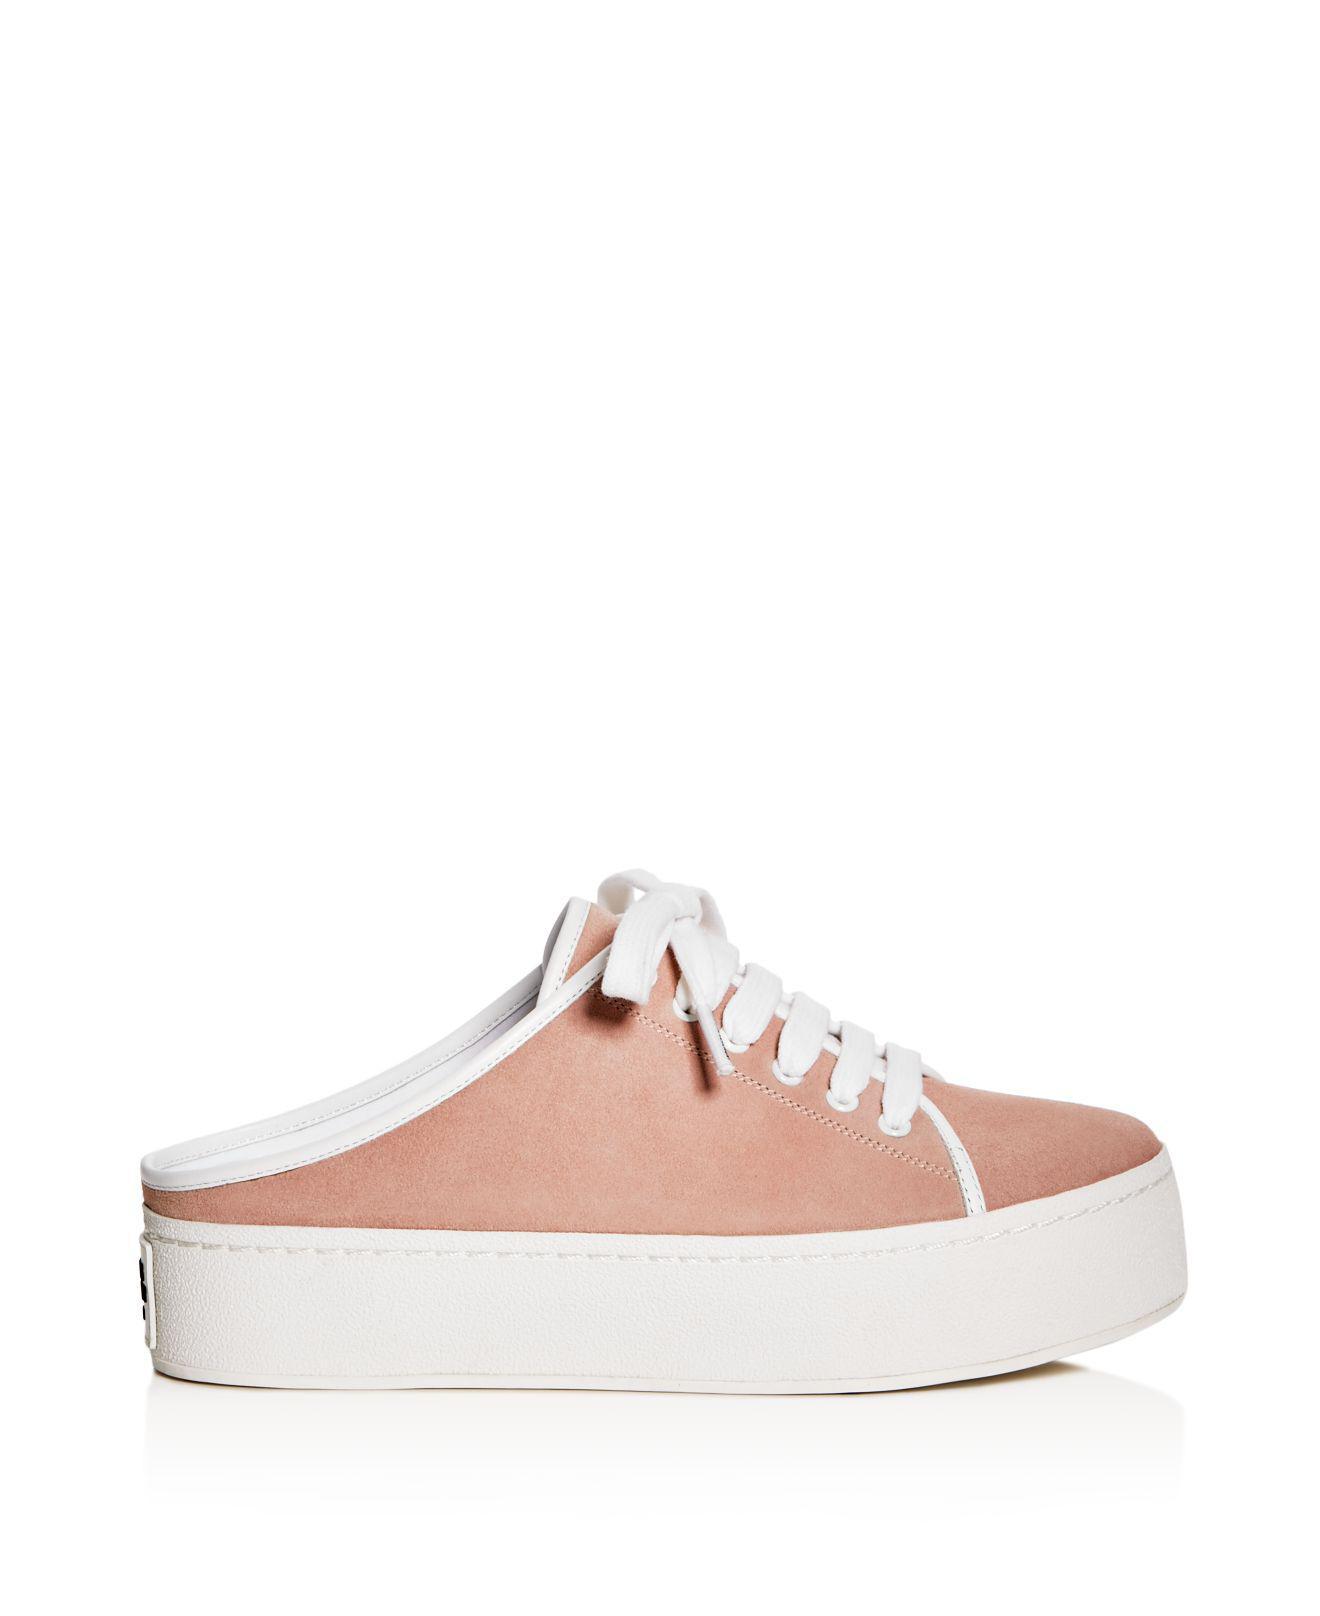 Globe Women S Shoes